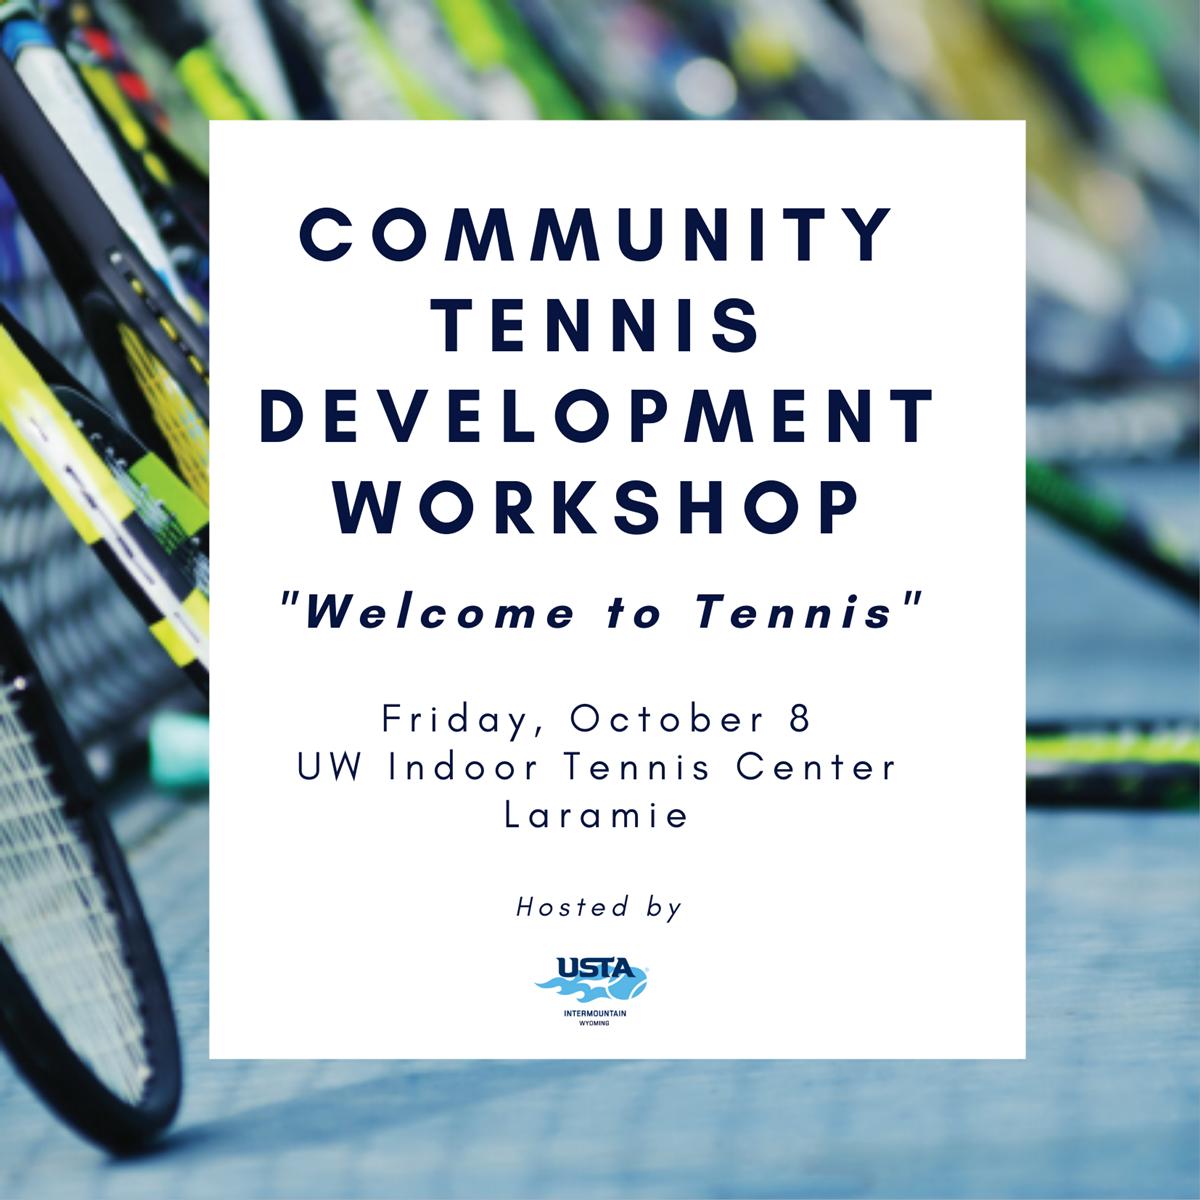 Community_Tennis_Development_Workshop_2021